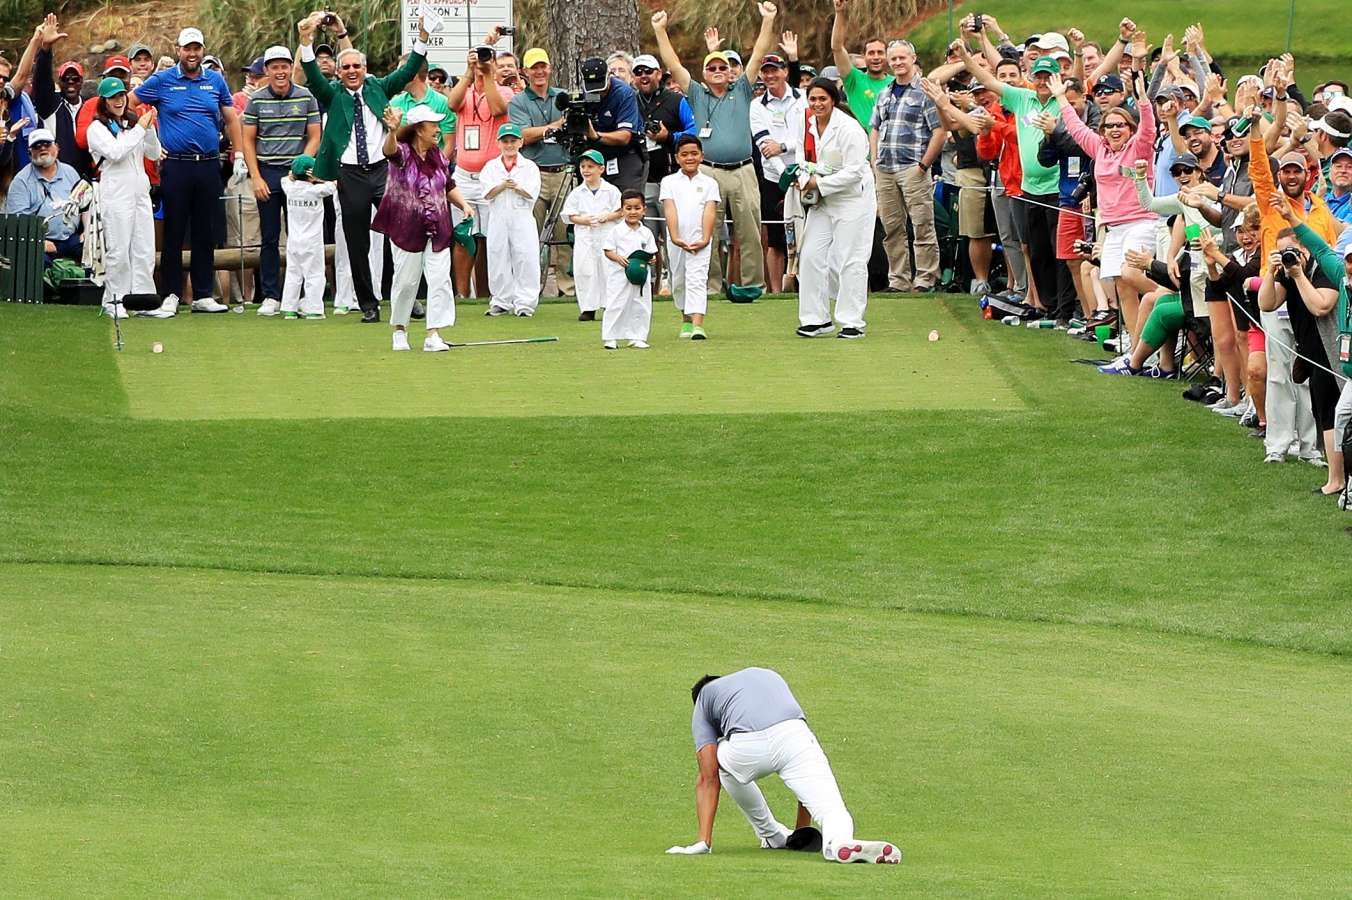 Tony Finau dislocates ankle celebrating hole-in-one at US Masters